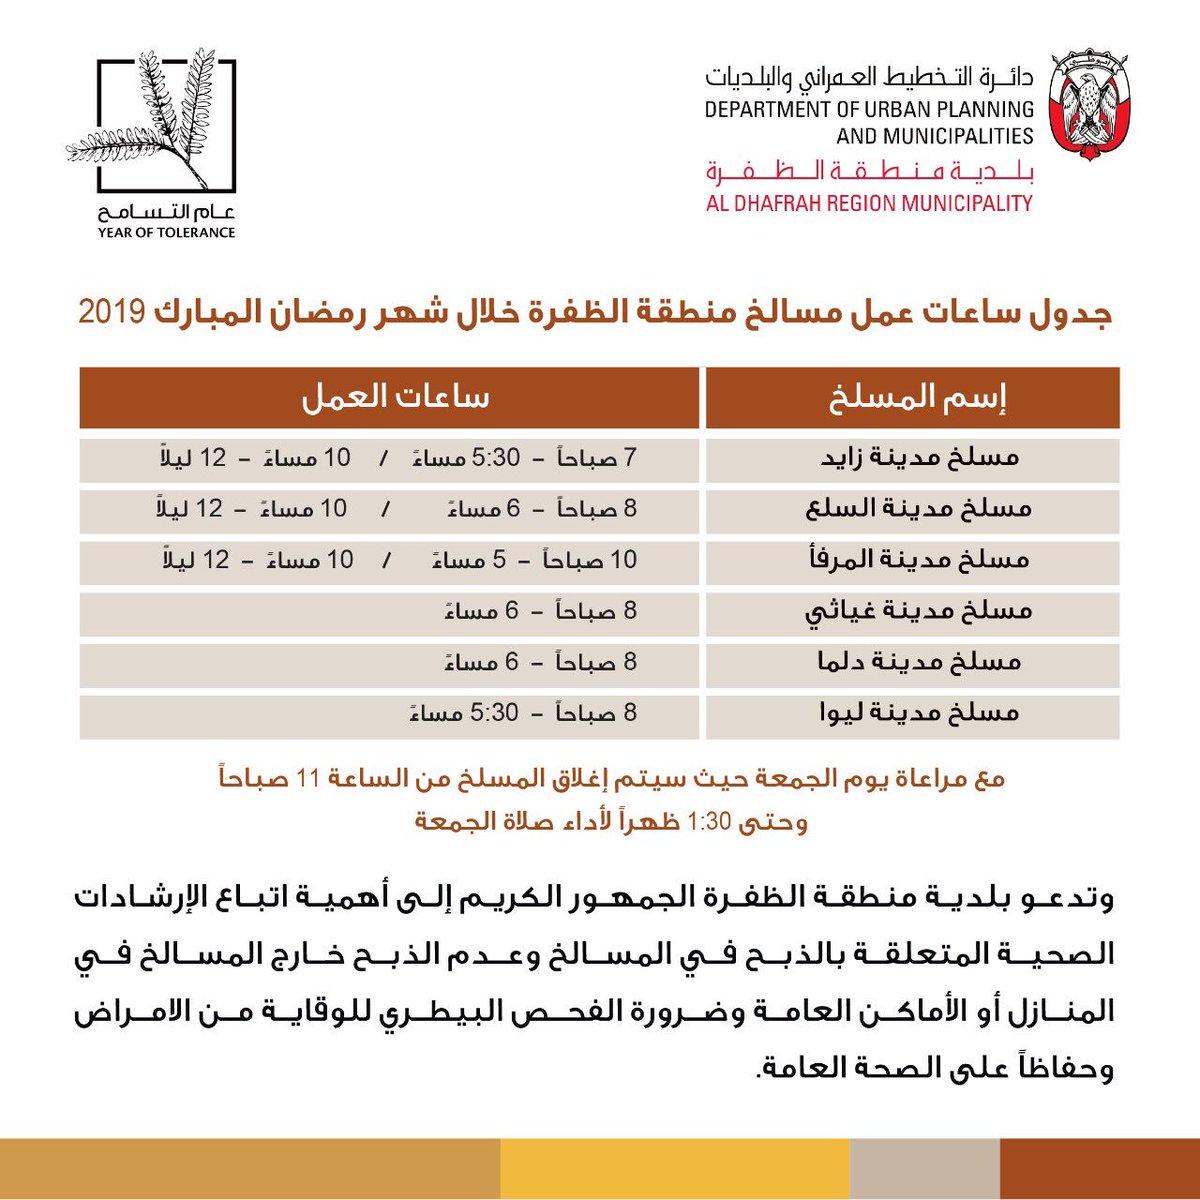 مزعج خلفية تجاهل ساعات دوام مرور ابوظبي في رمضان ٢٠١٨ Translucent Network Org